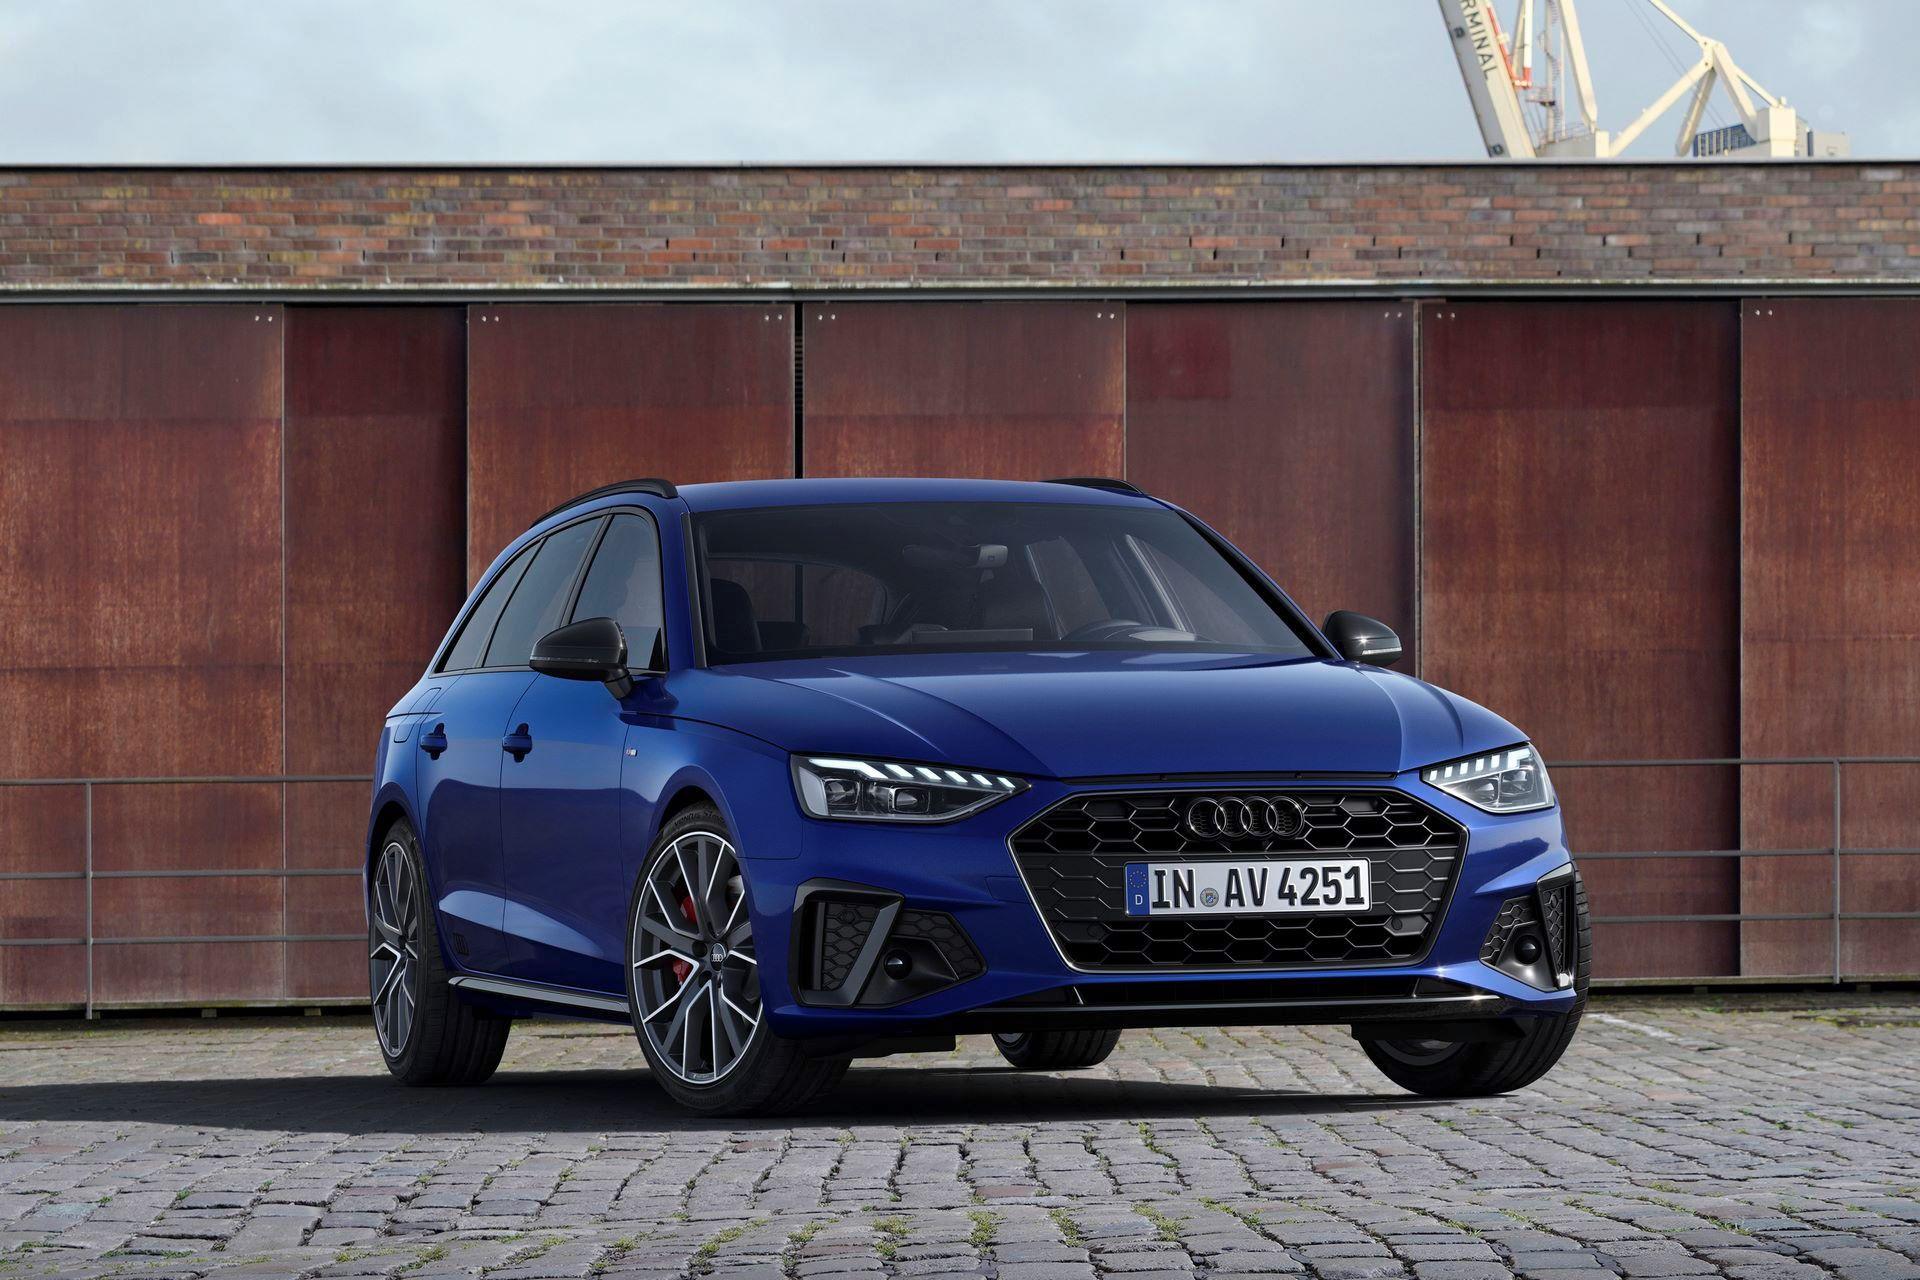 Audi-A4-A5-Q7-Q8-Competition-And-Competition-Plus-Trims-53